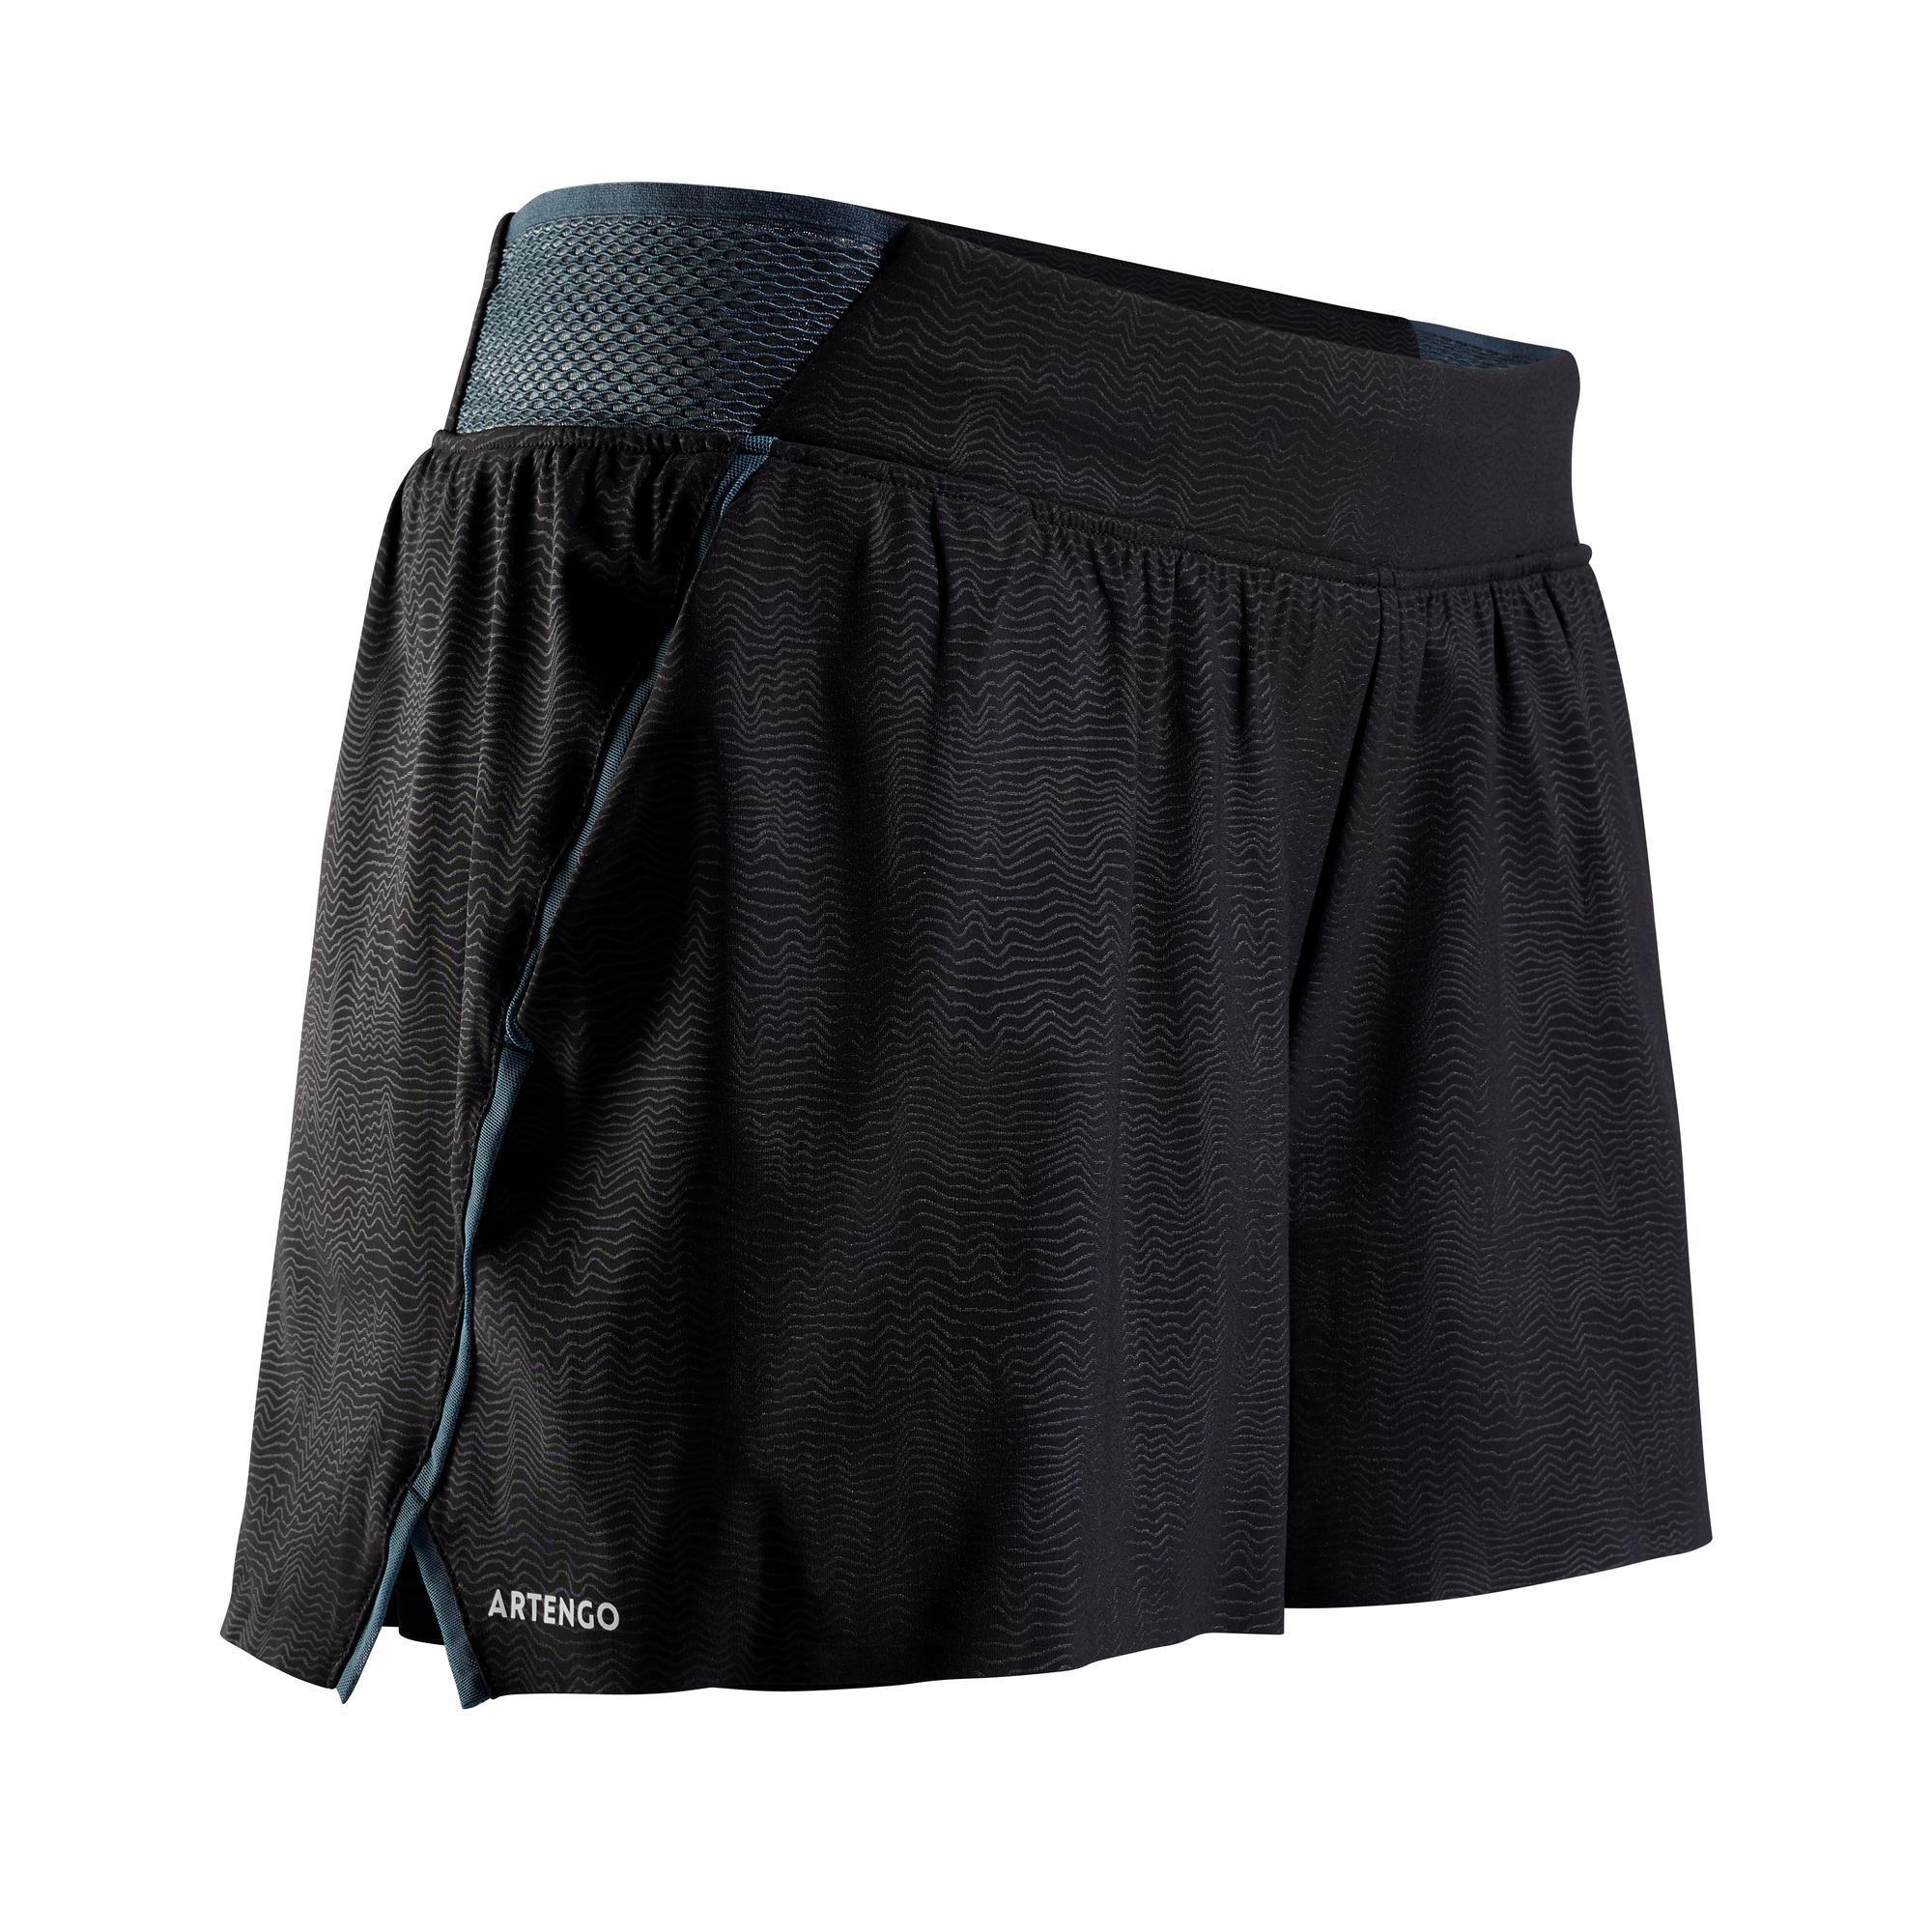 Tennis-Shorts SH light 900 Tennis Damen grau/schwarz | Sportbekleidung > Sporthosen > Tennisshorts | Schwarz - Grau - Blau | Artengo